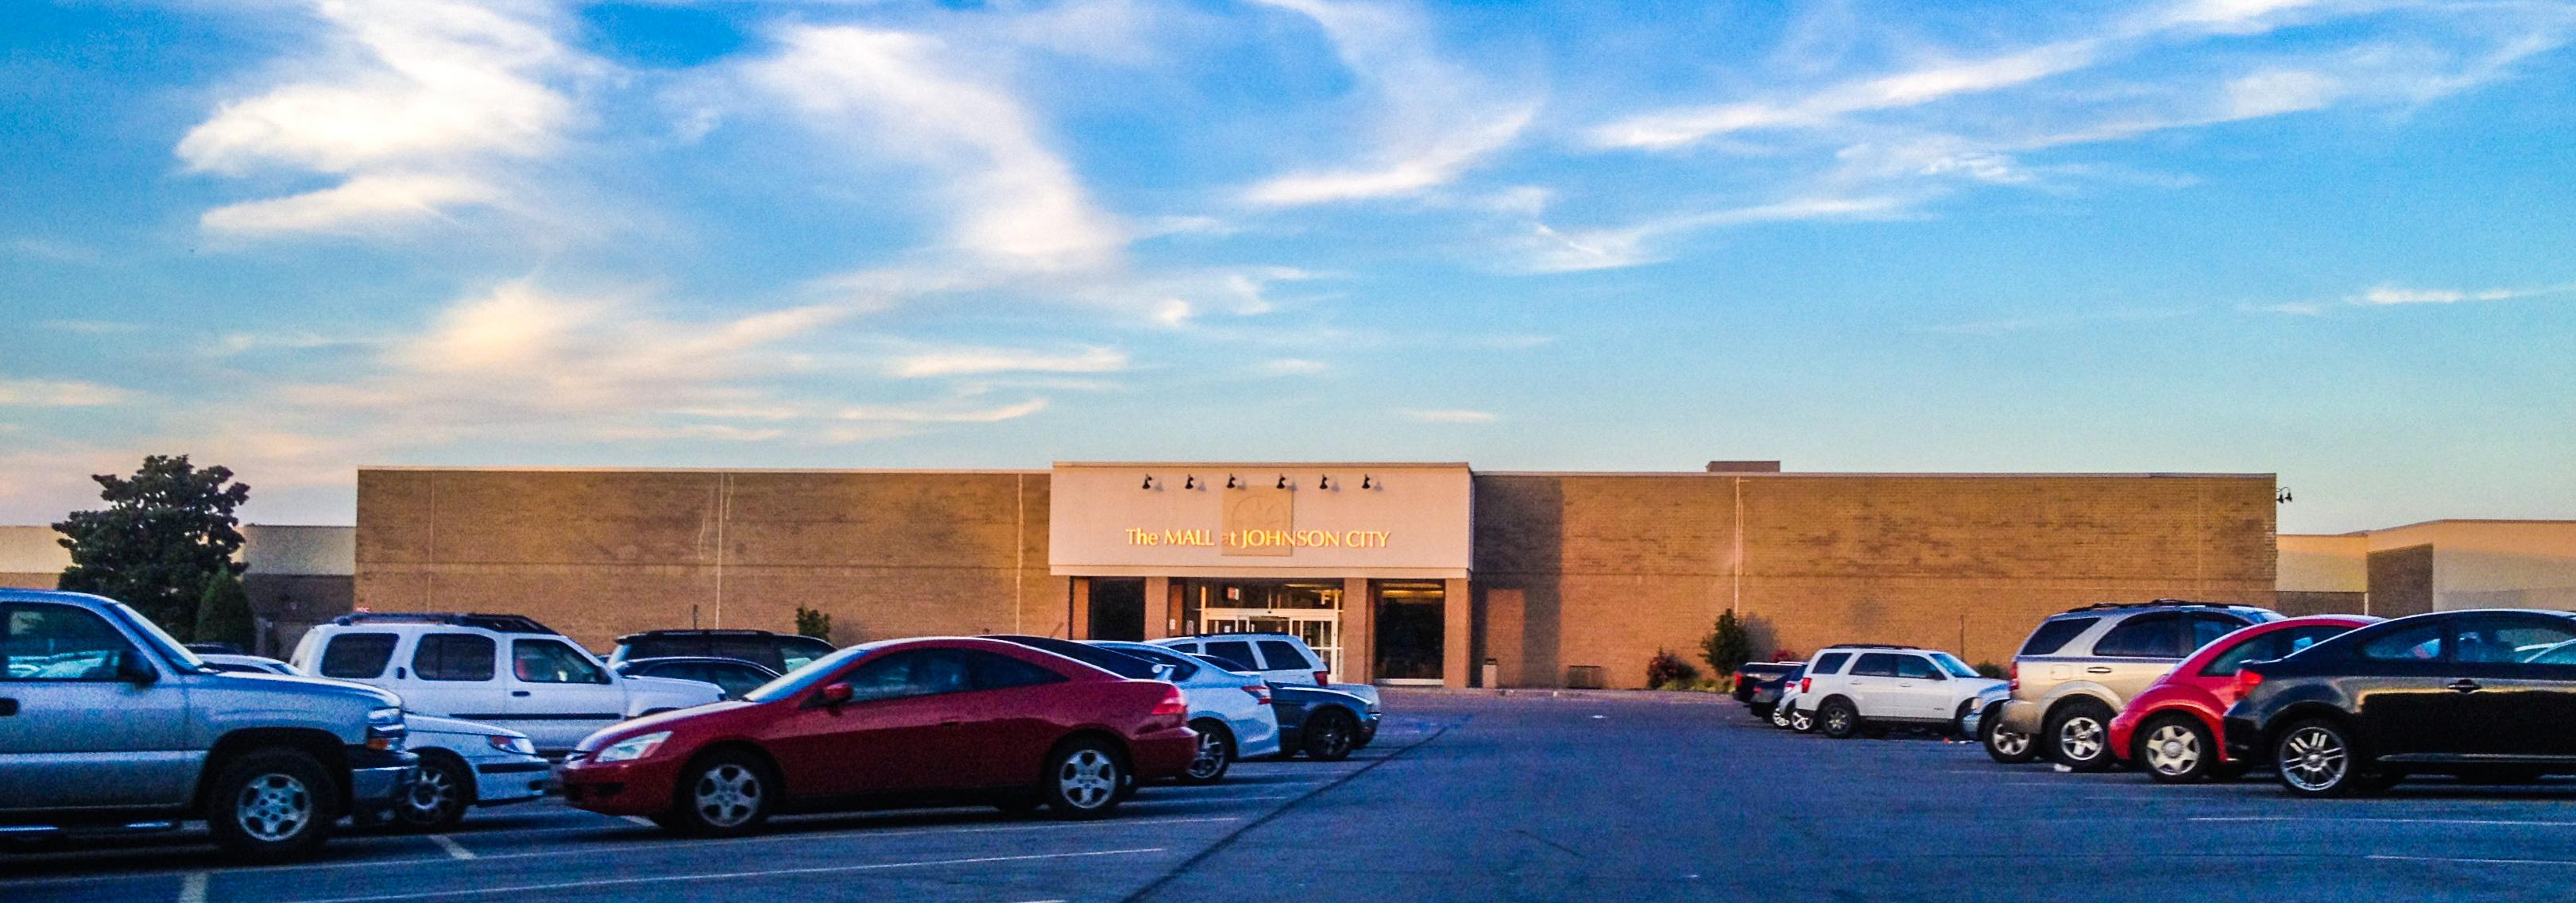 9f6816b773c The Mall at Johnson City - Wikipedia